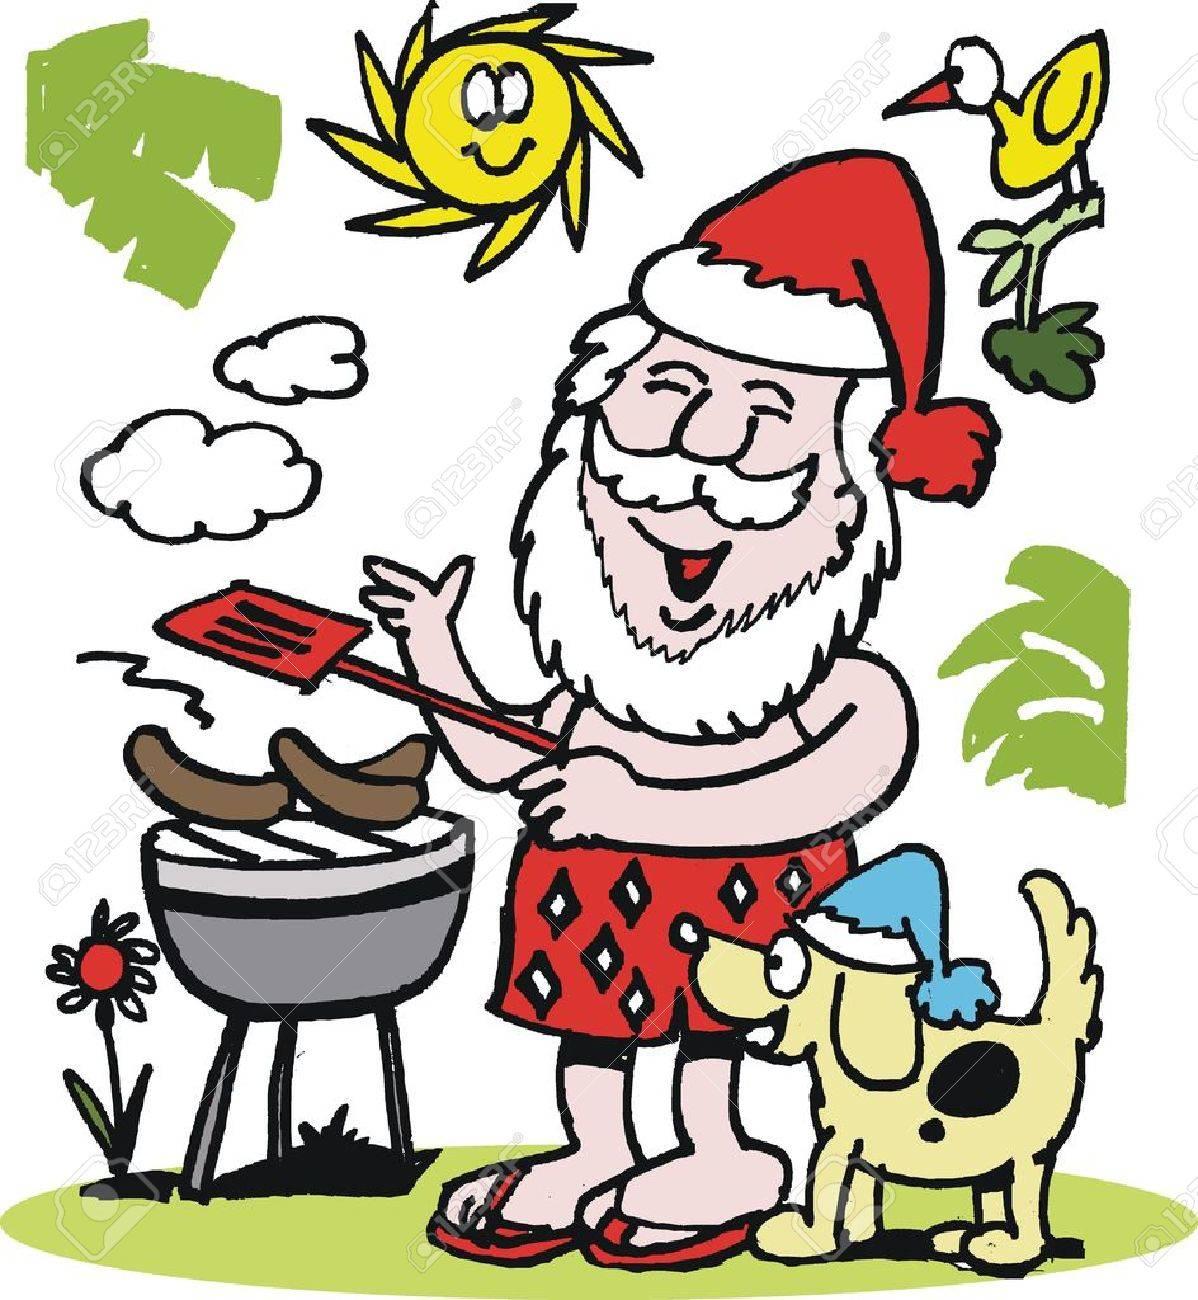 Dessin Barbecue dessin animé de santa claus ayant barbecue clip art libres de droits